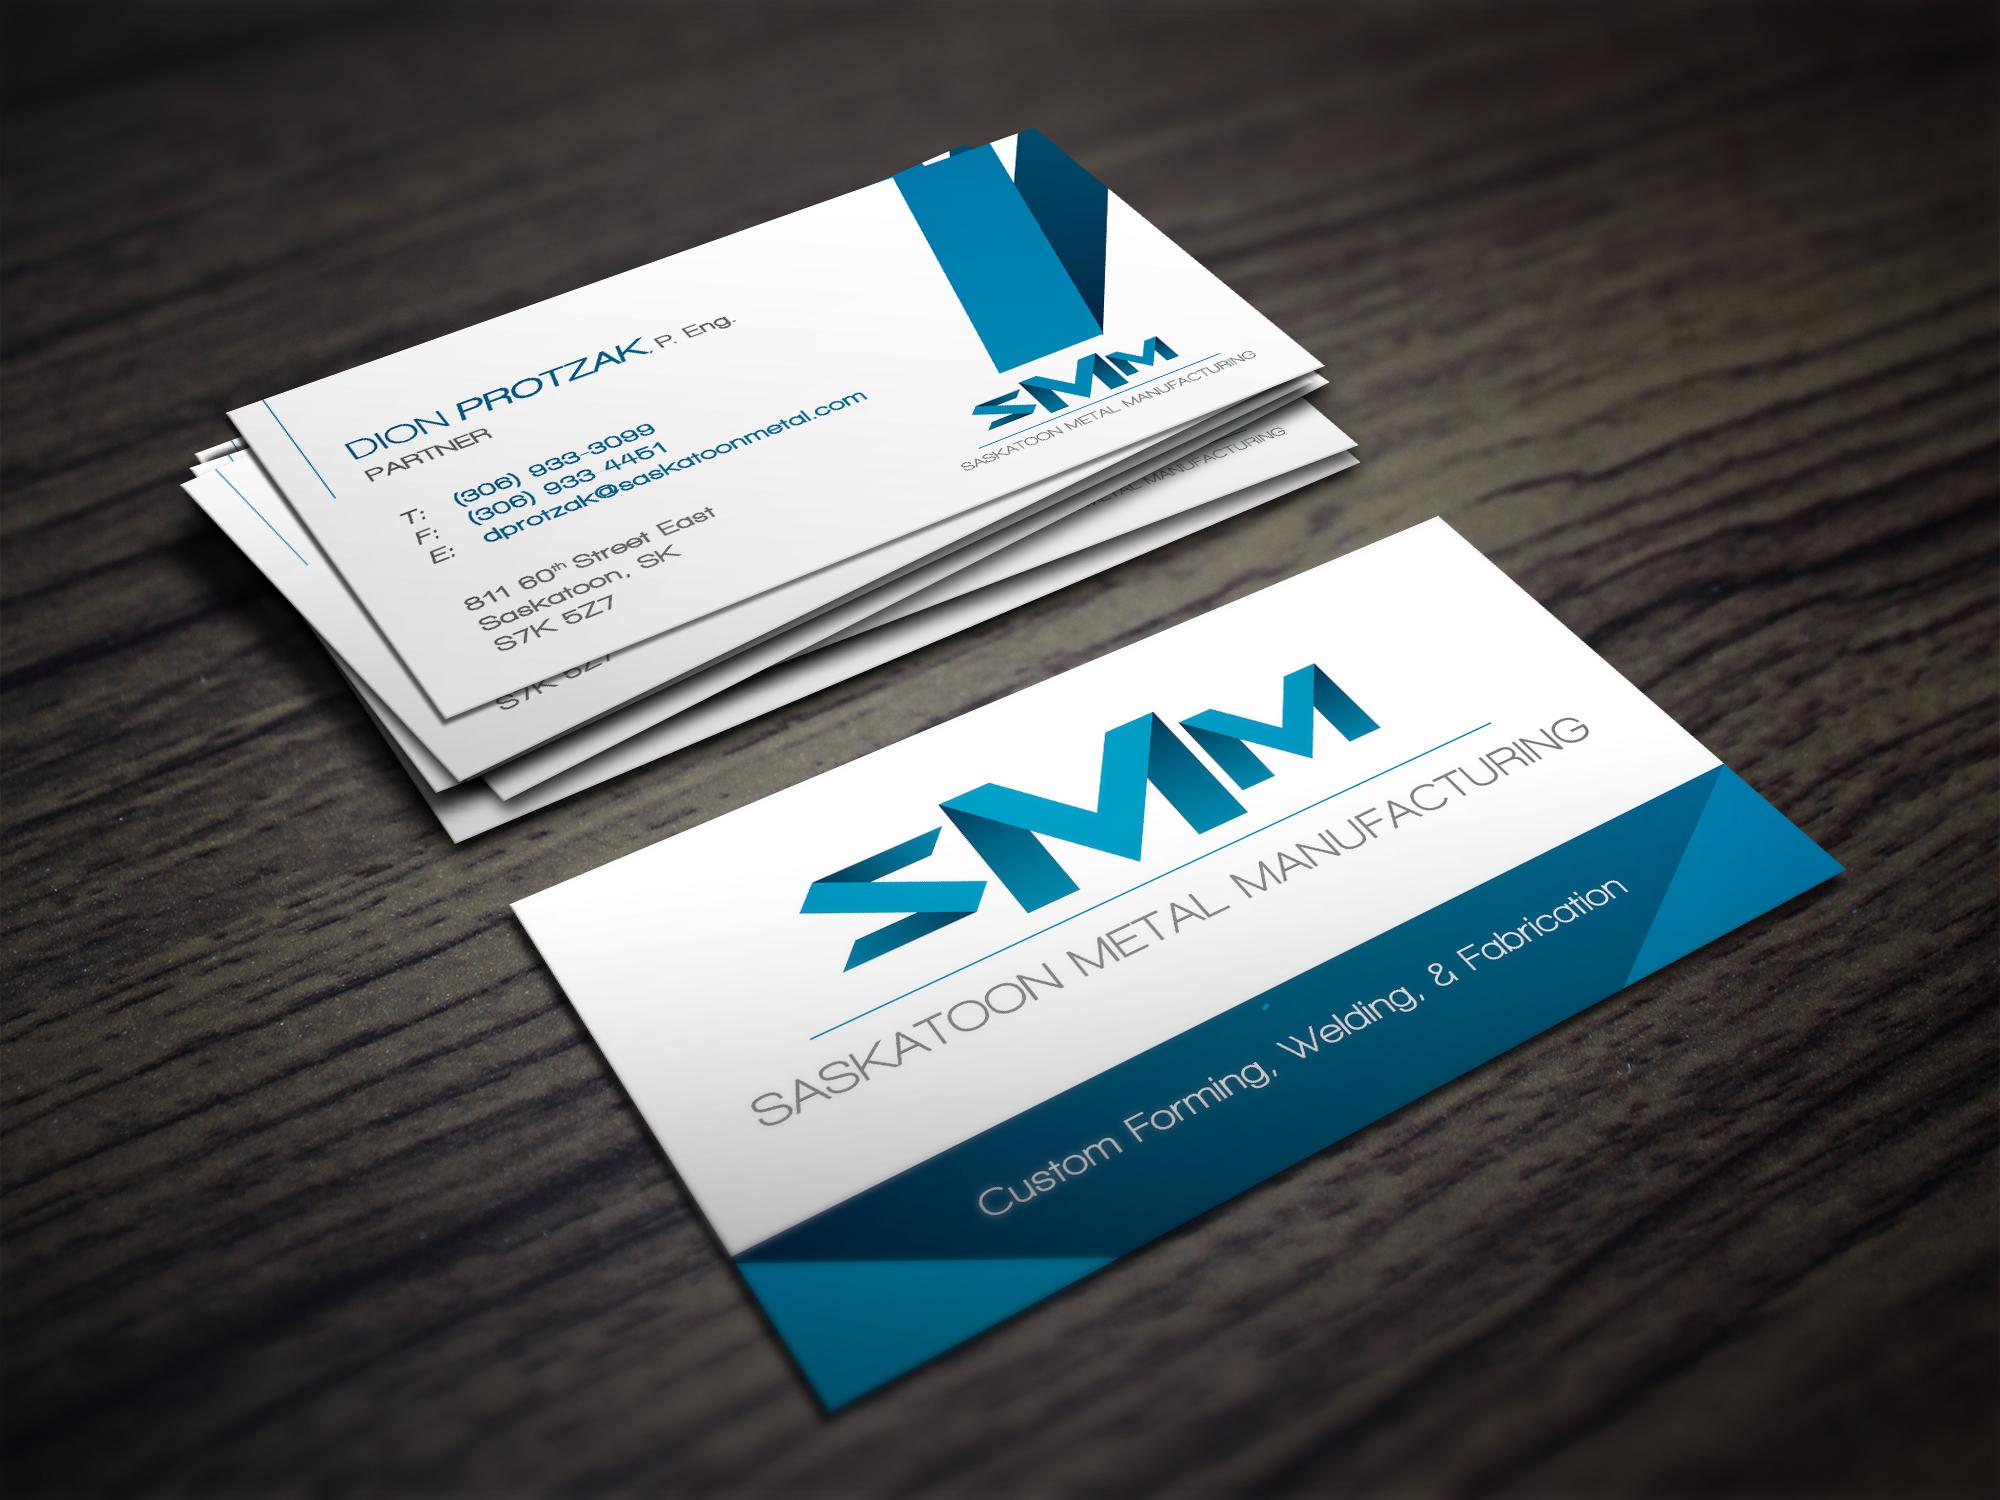 SMM-Biz-card-mockup.jpg